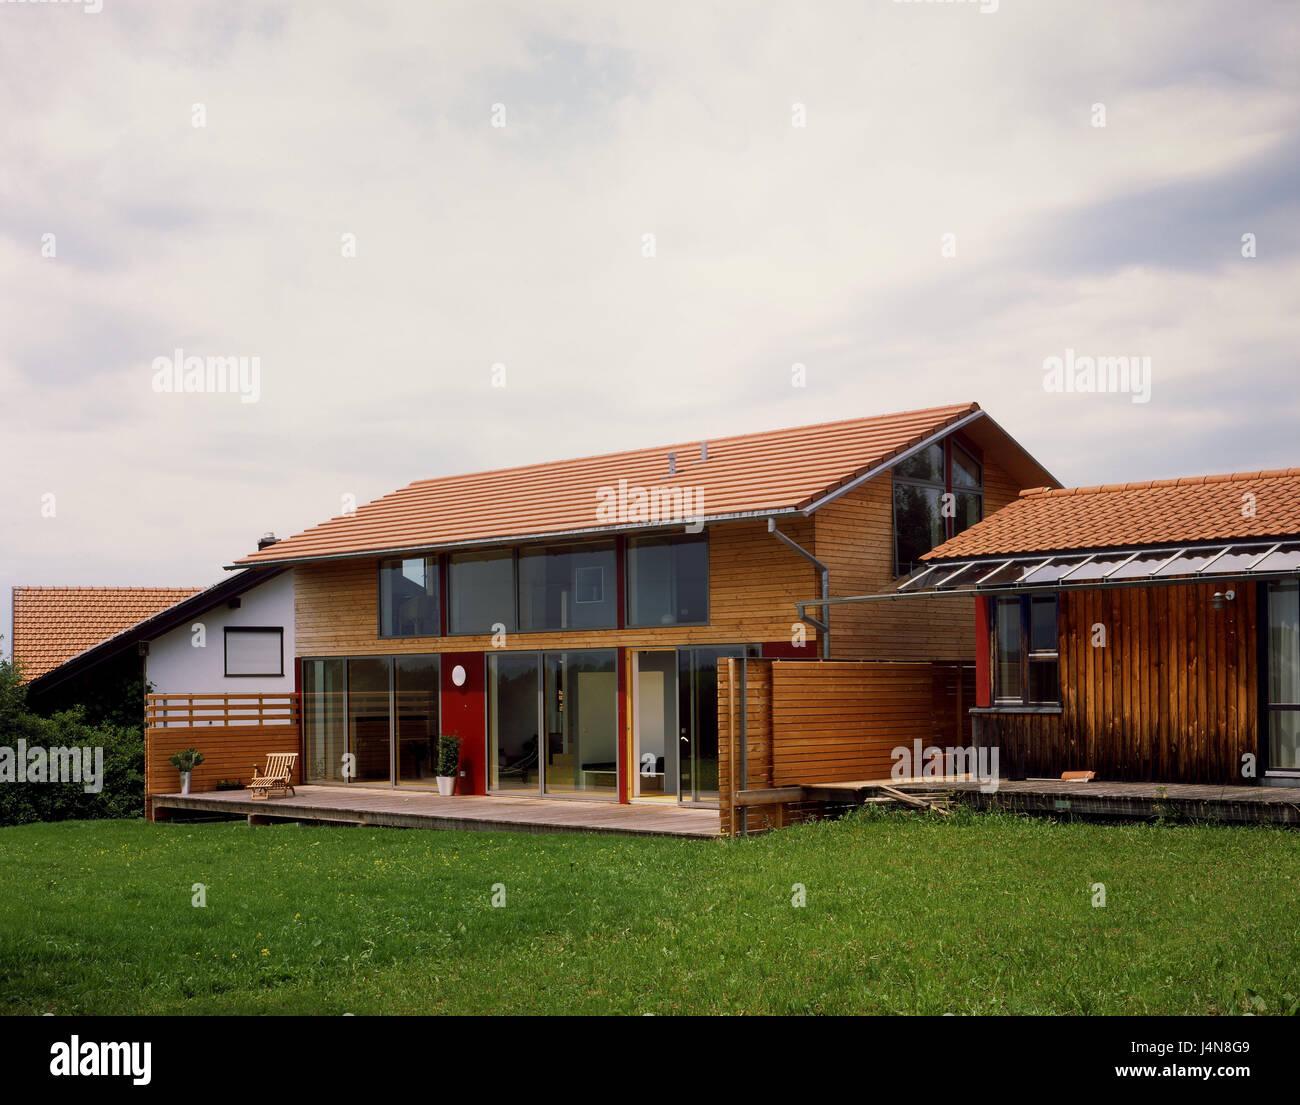 Wohnhaus eberle wetter boarding glasfront terrasse for Moderner baustil einfamilienhaus